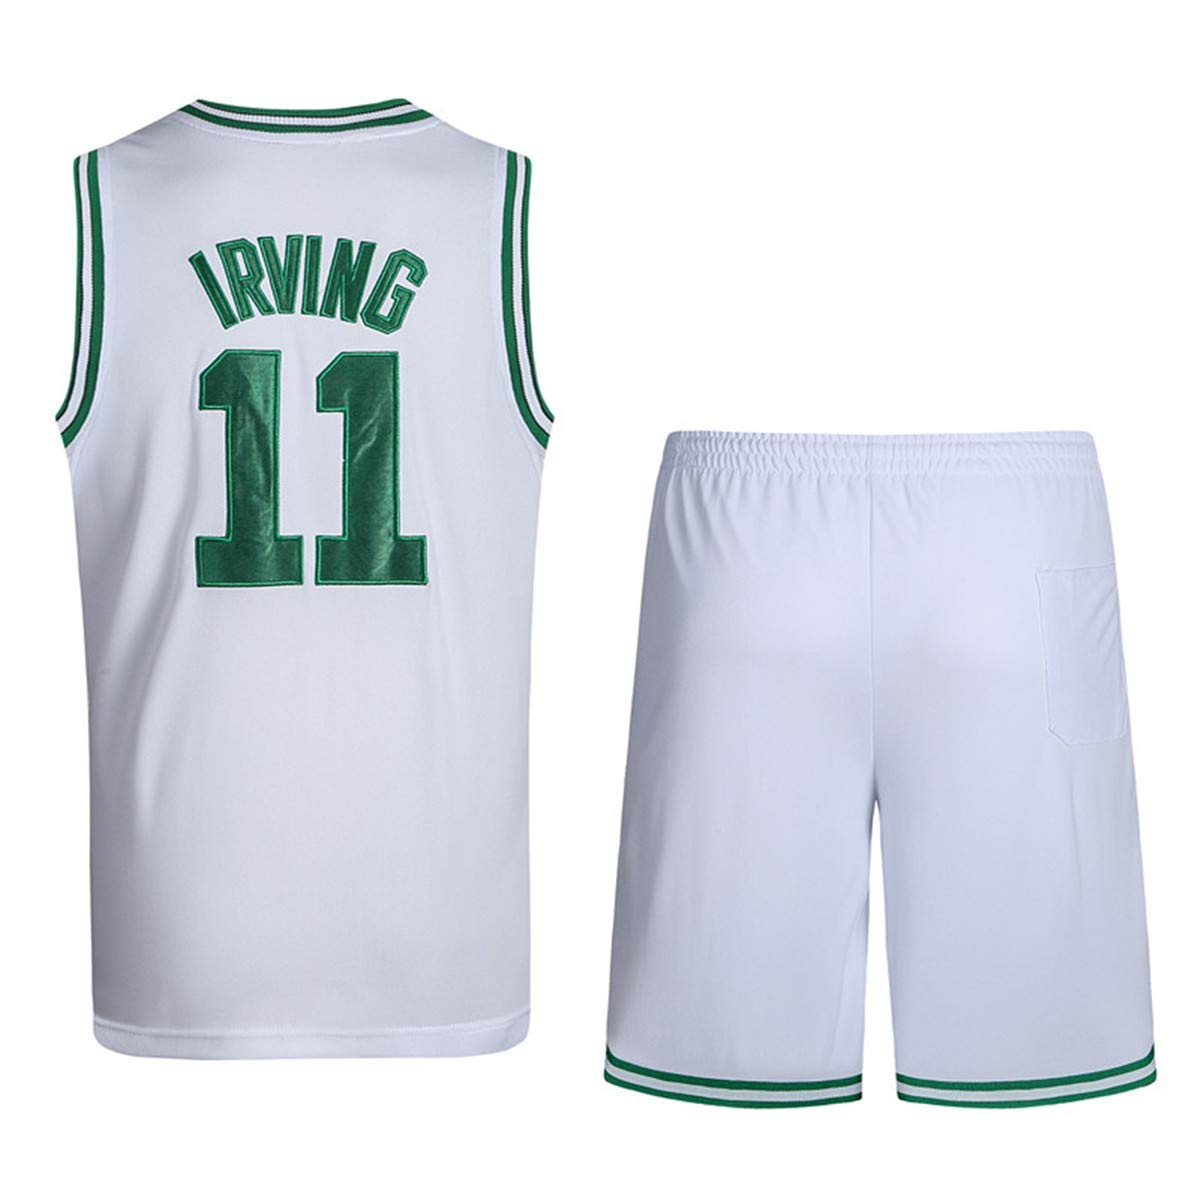 AFDLT NBA Celtics No. 11 Juventus Jersey Herren Basketball Wear Set Trainingsbekleidung B07PDZZ59P Spieltrikots Elegante Form